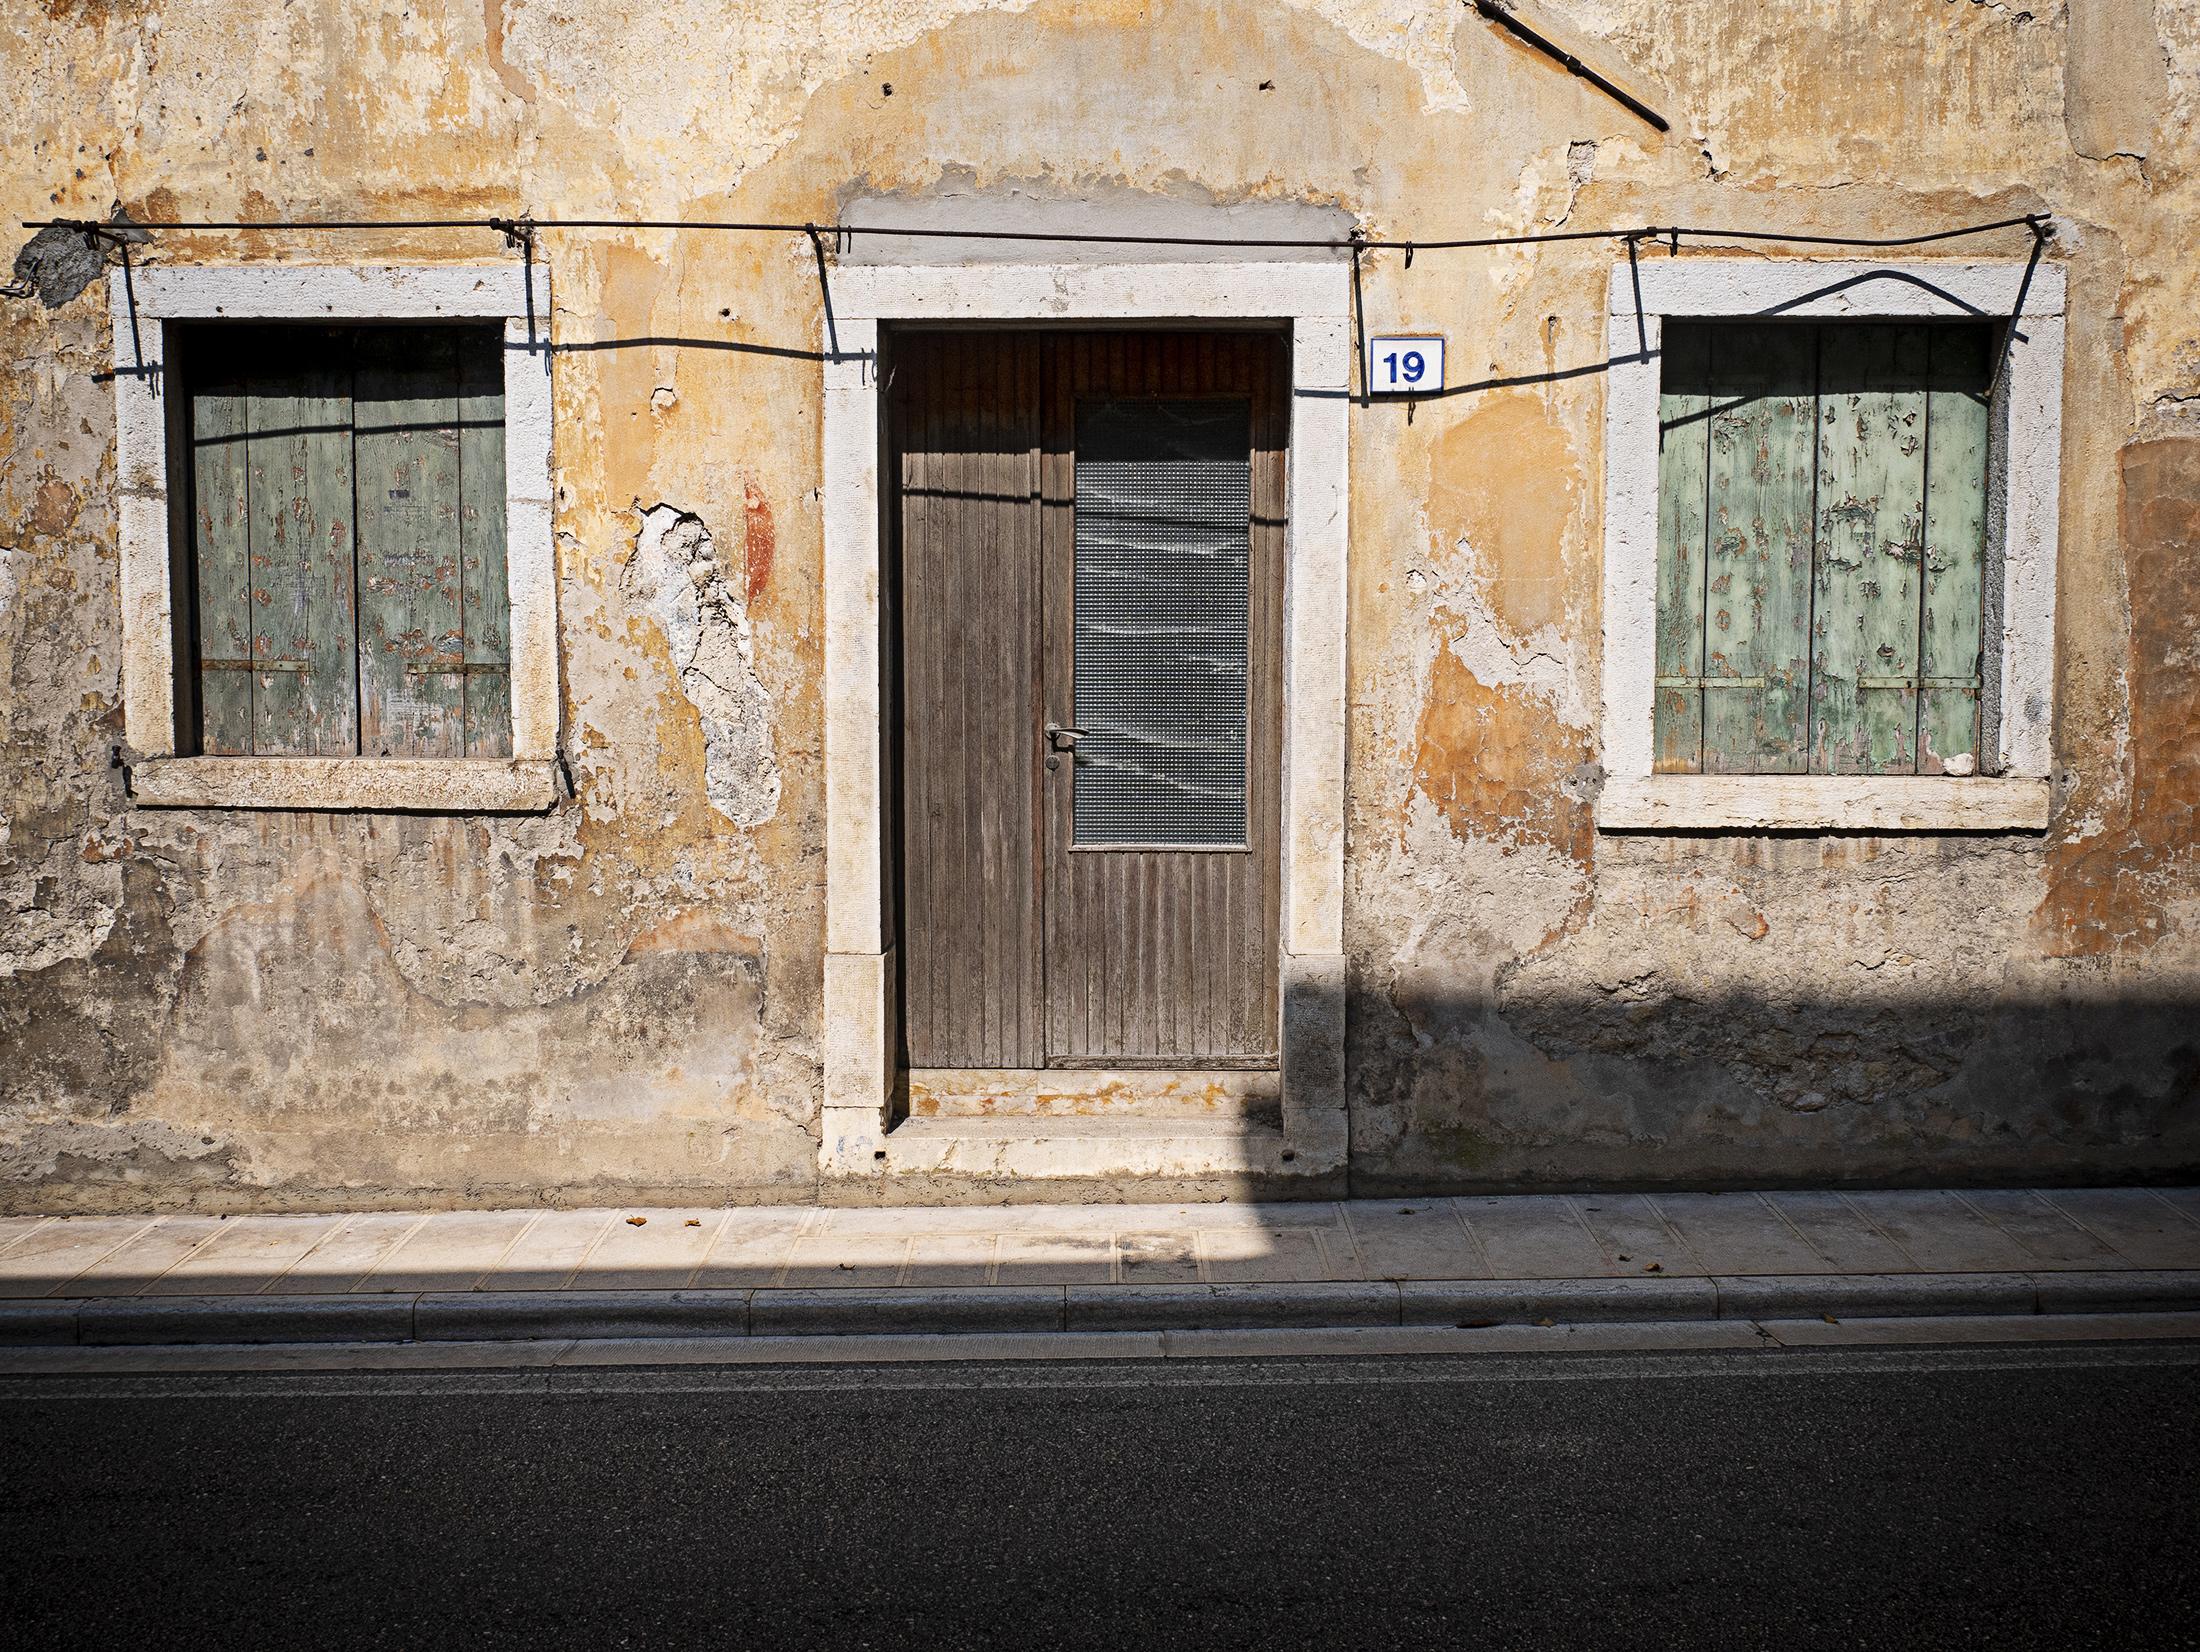 Italy, Polcenigo, Jarred Elrod, Photography, Walking